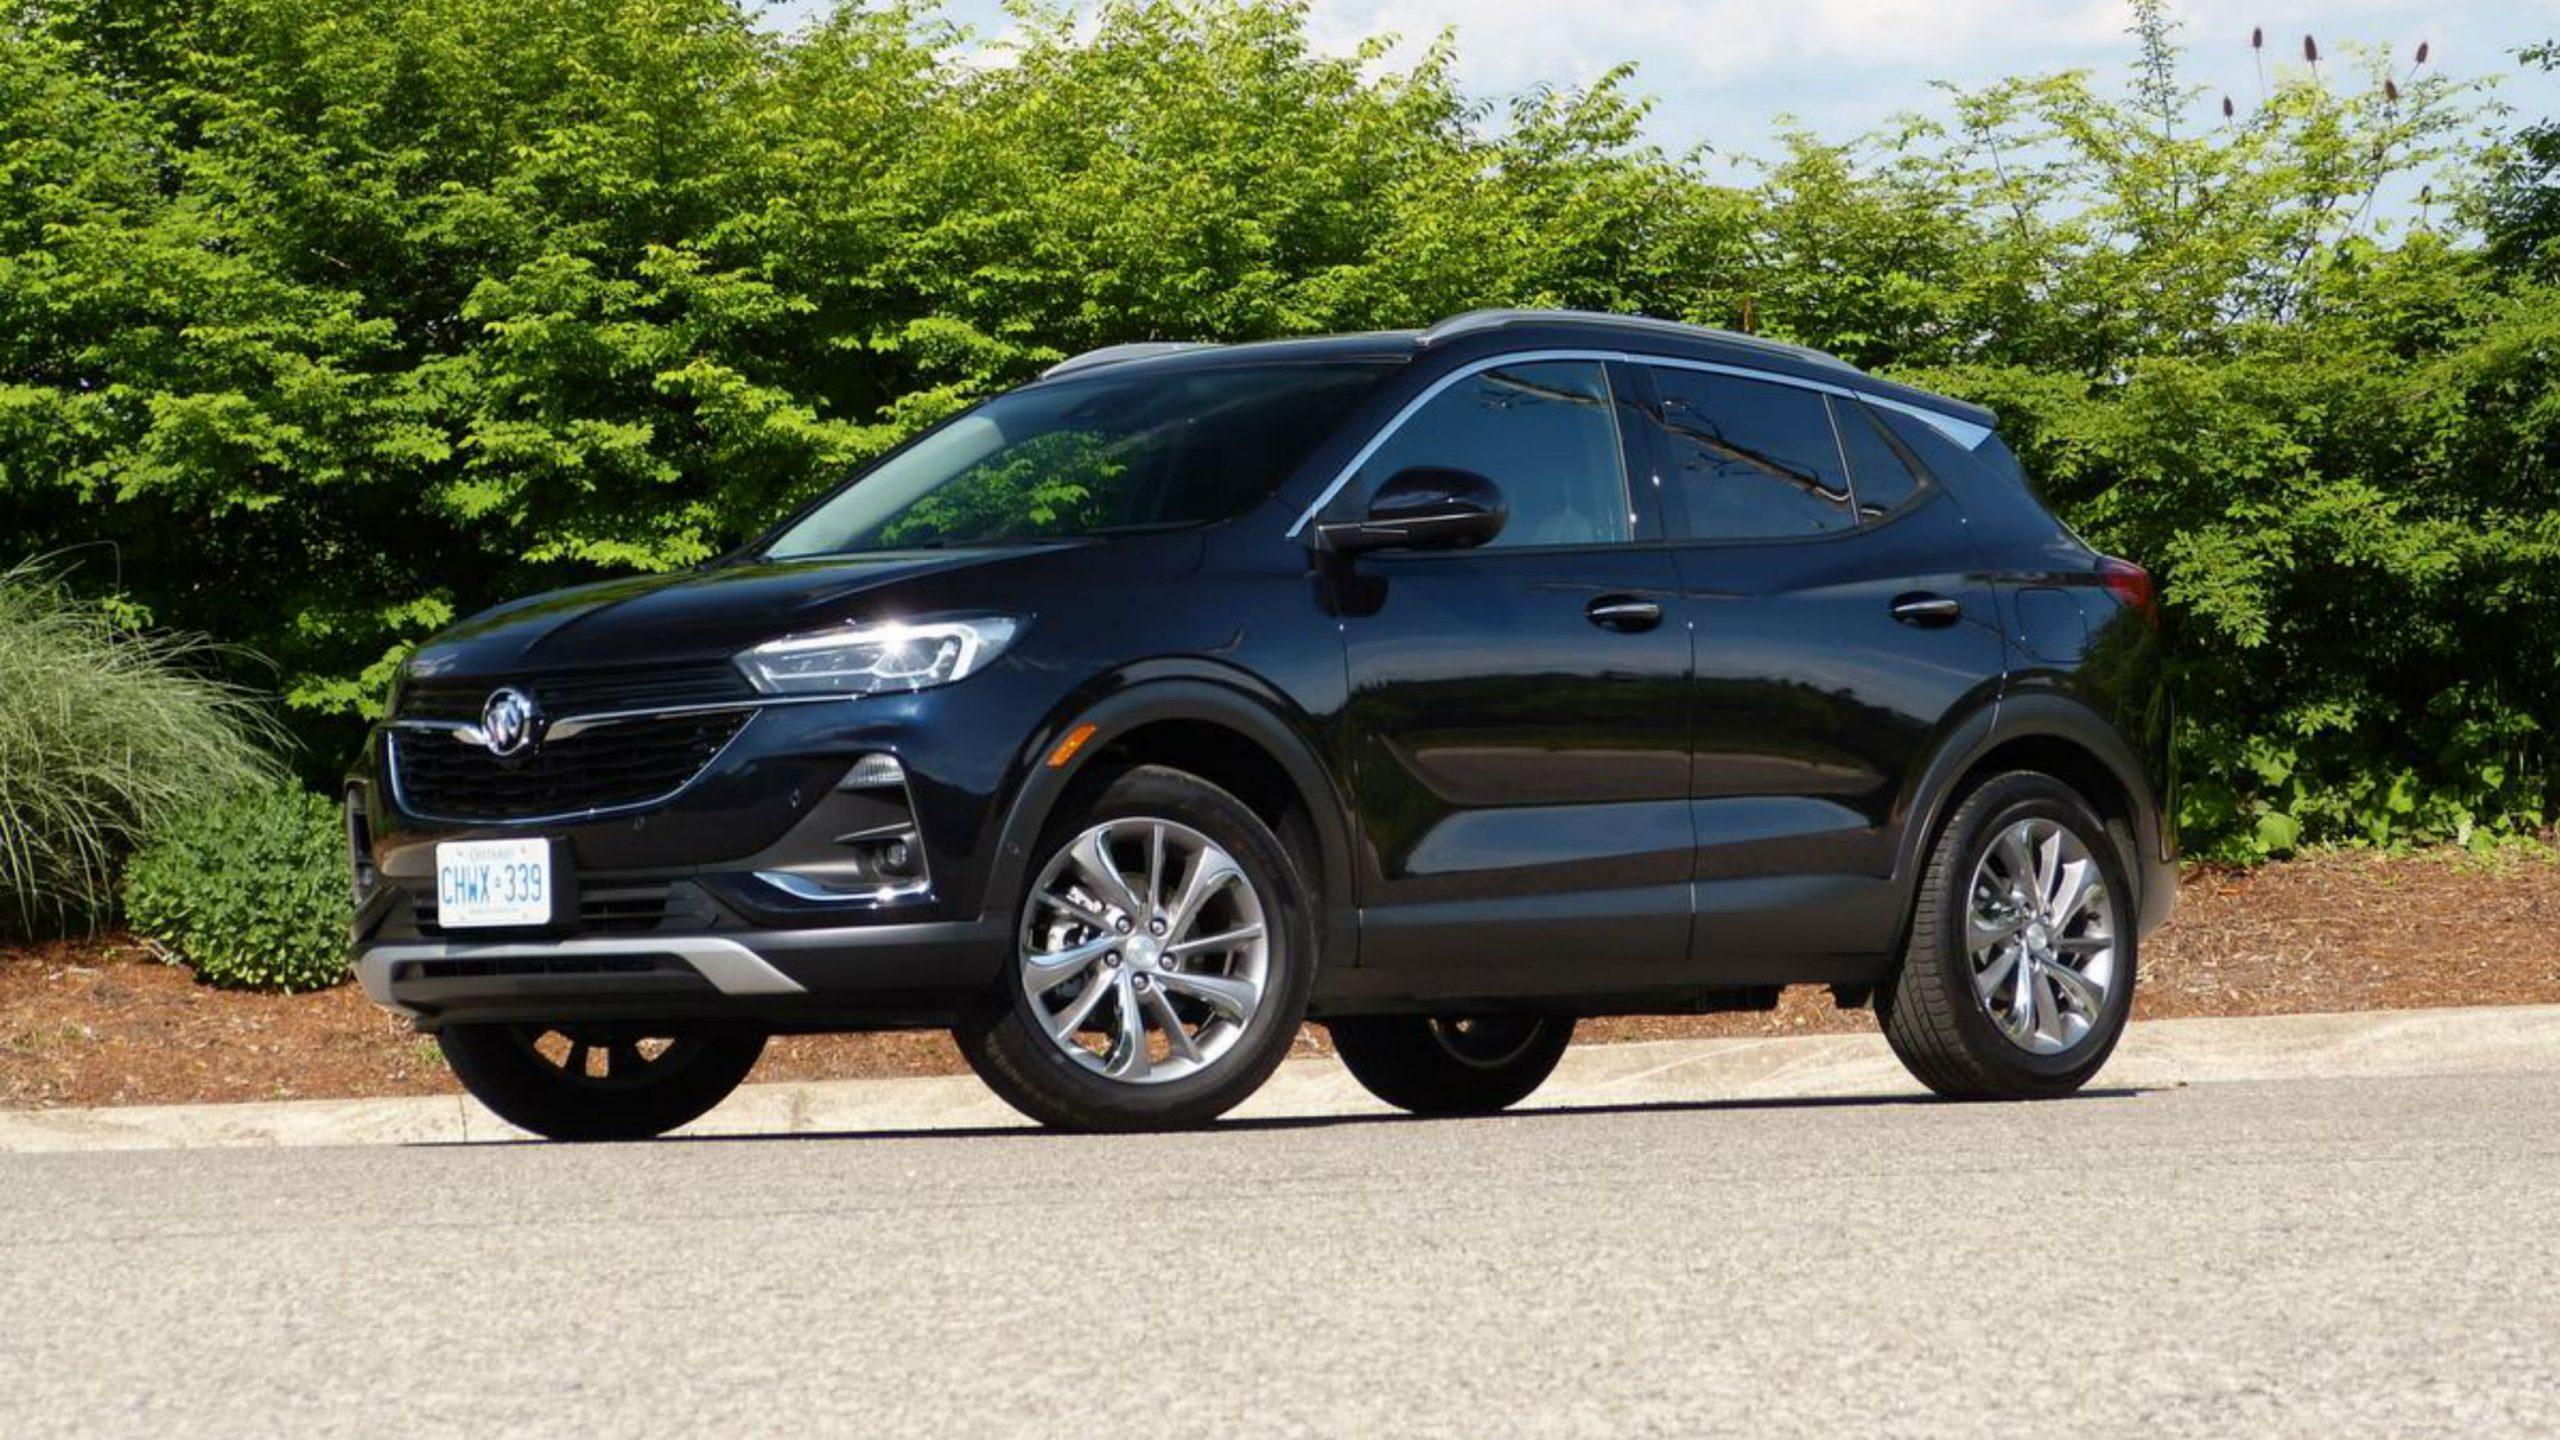 review: 2020 buick encore gx - wheels.ca